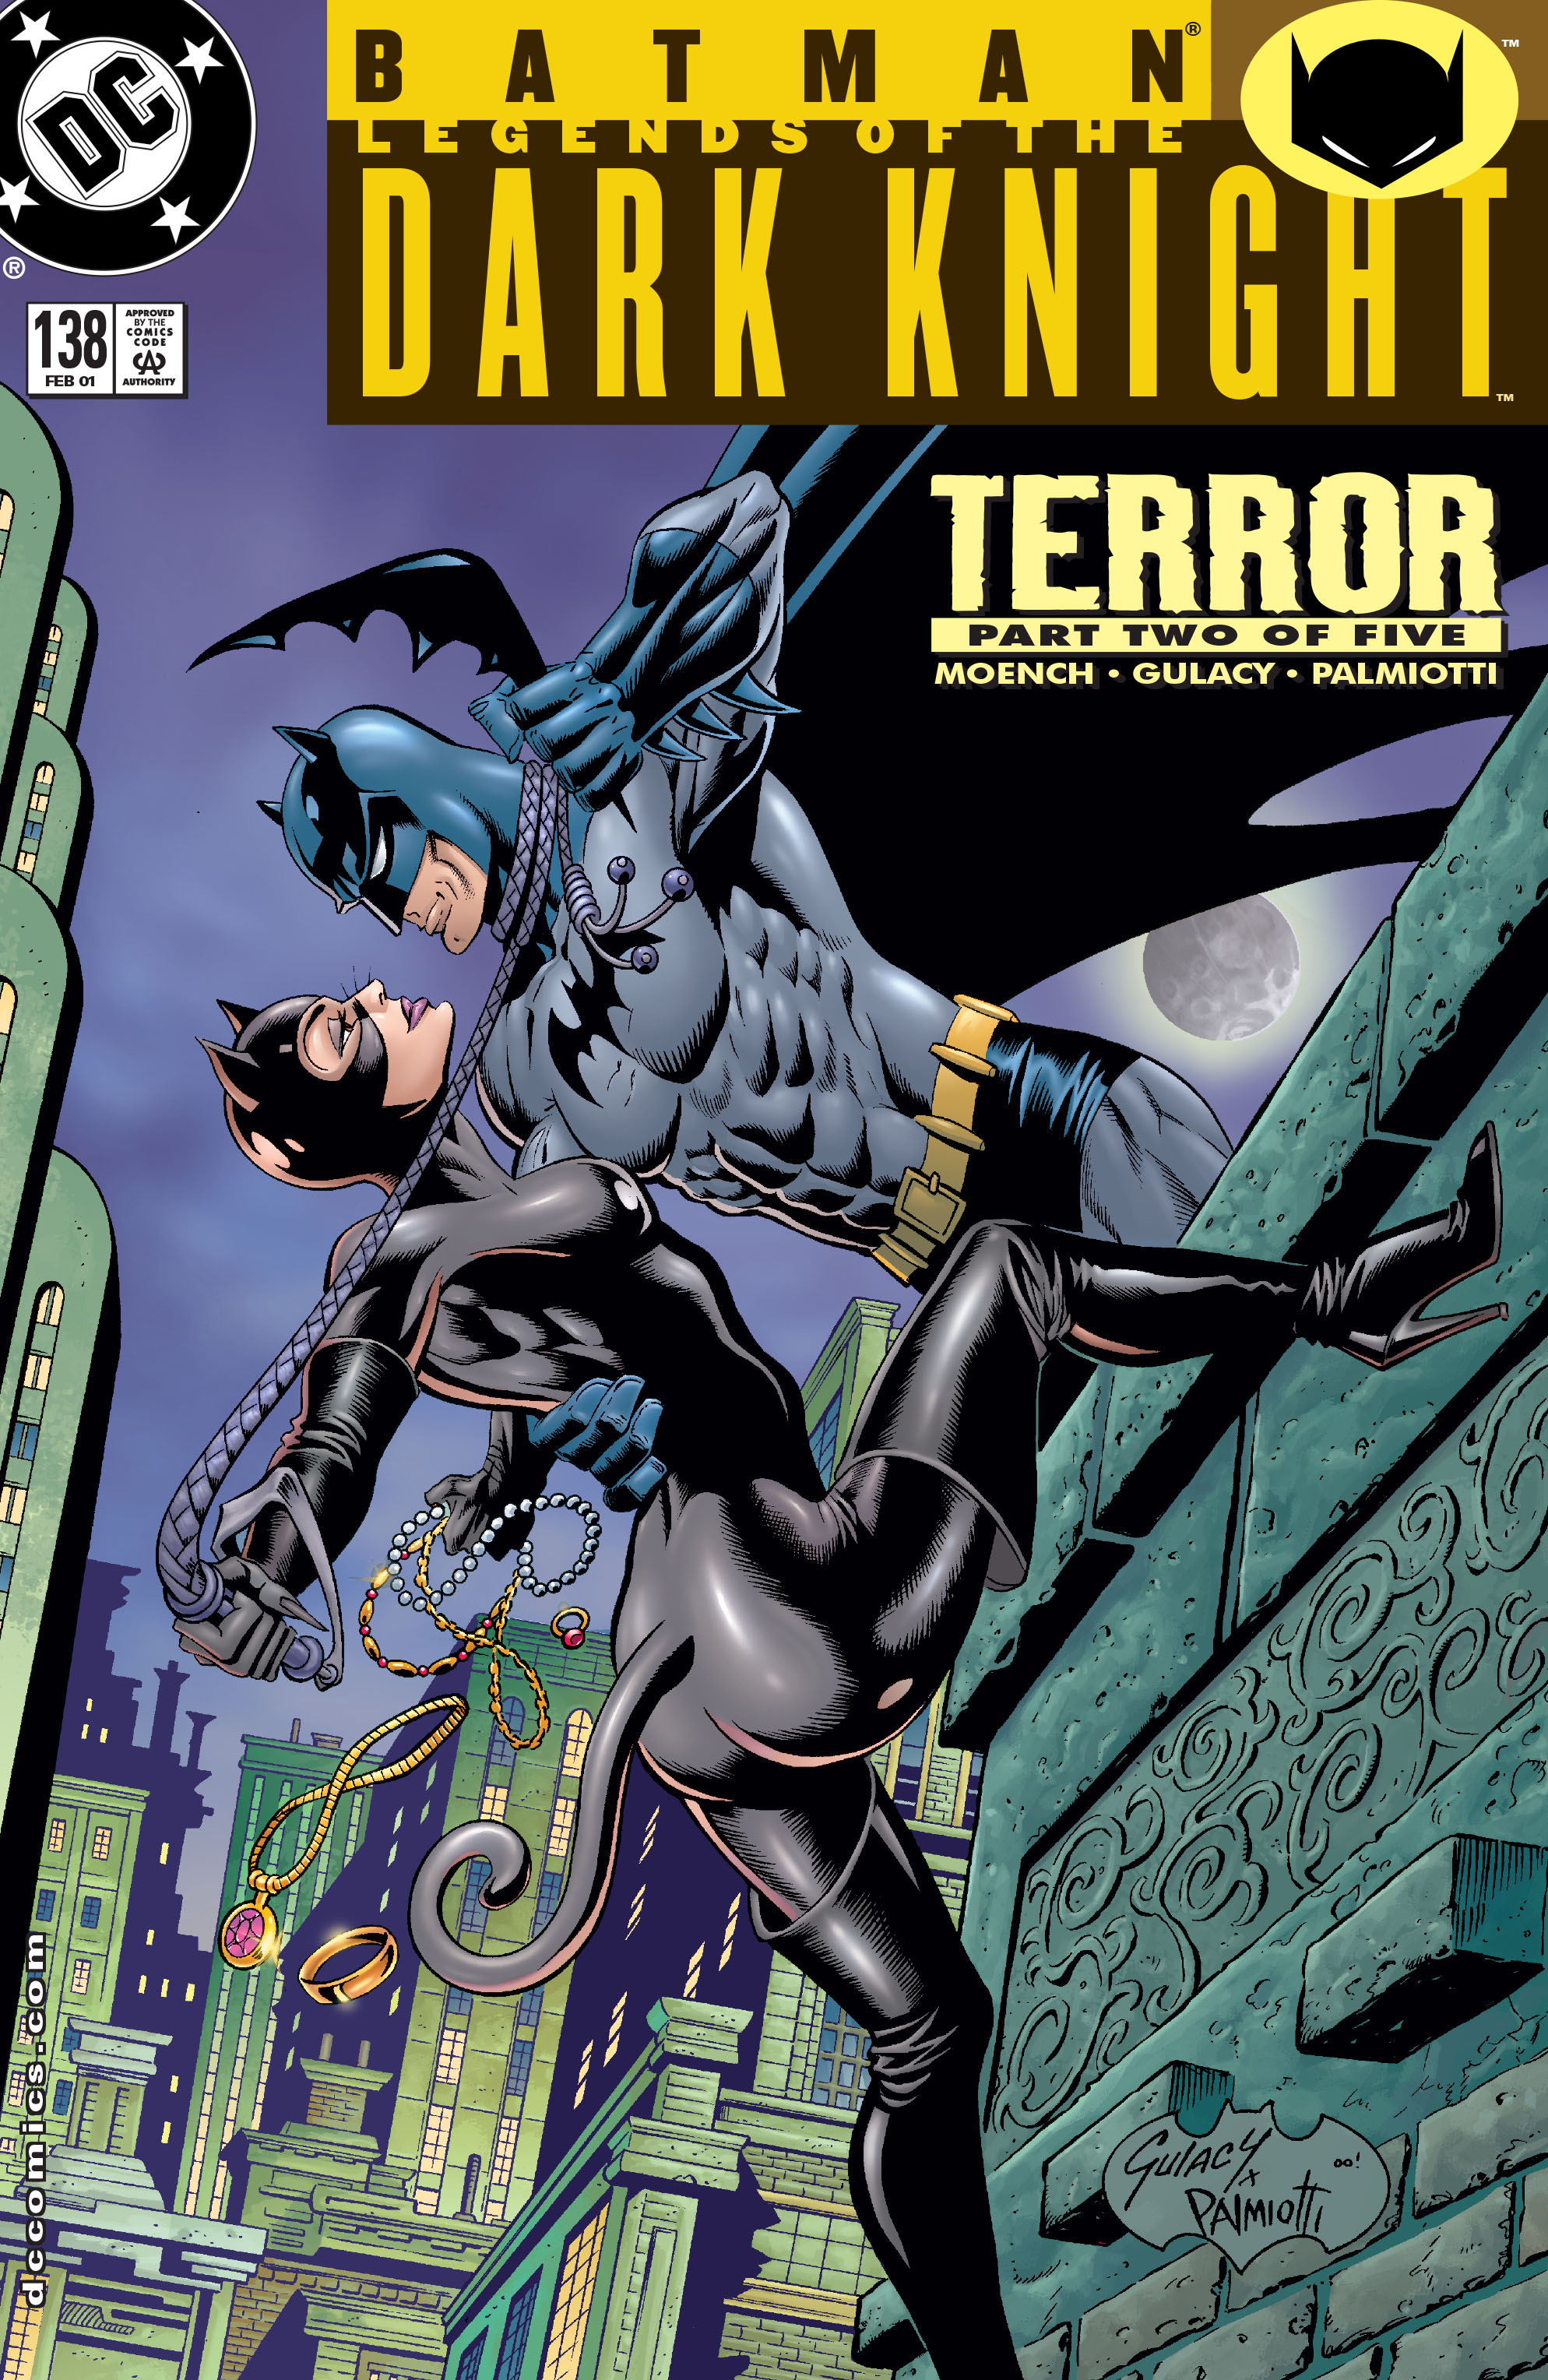 Batman: Legends of the Dark Knight 138 Page 1